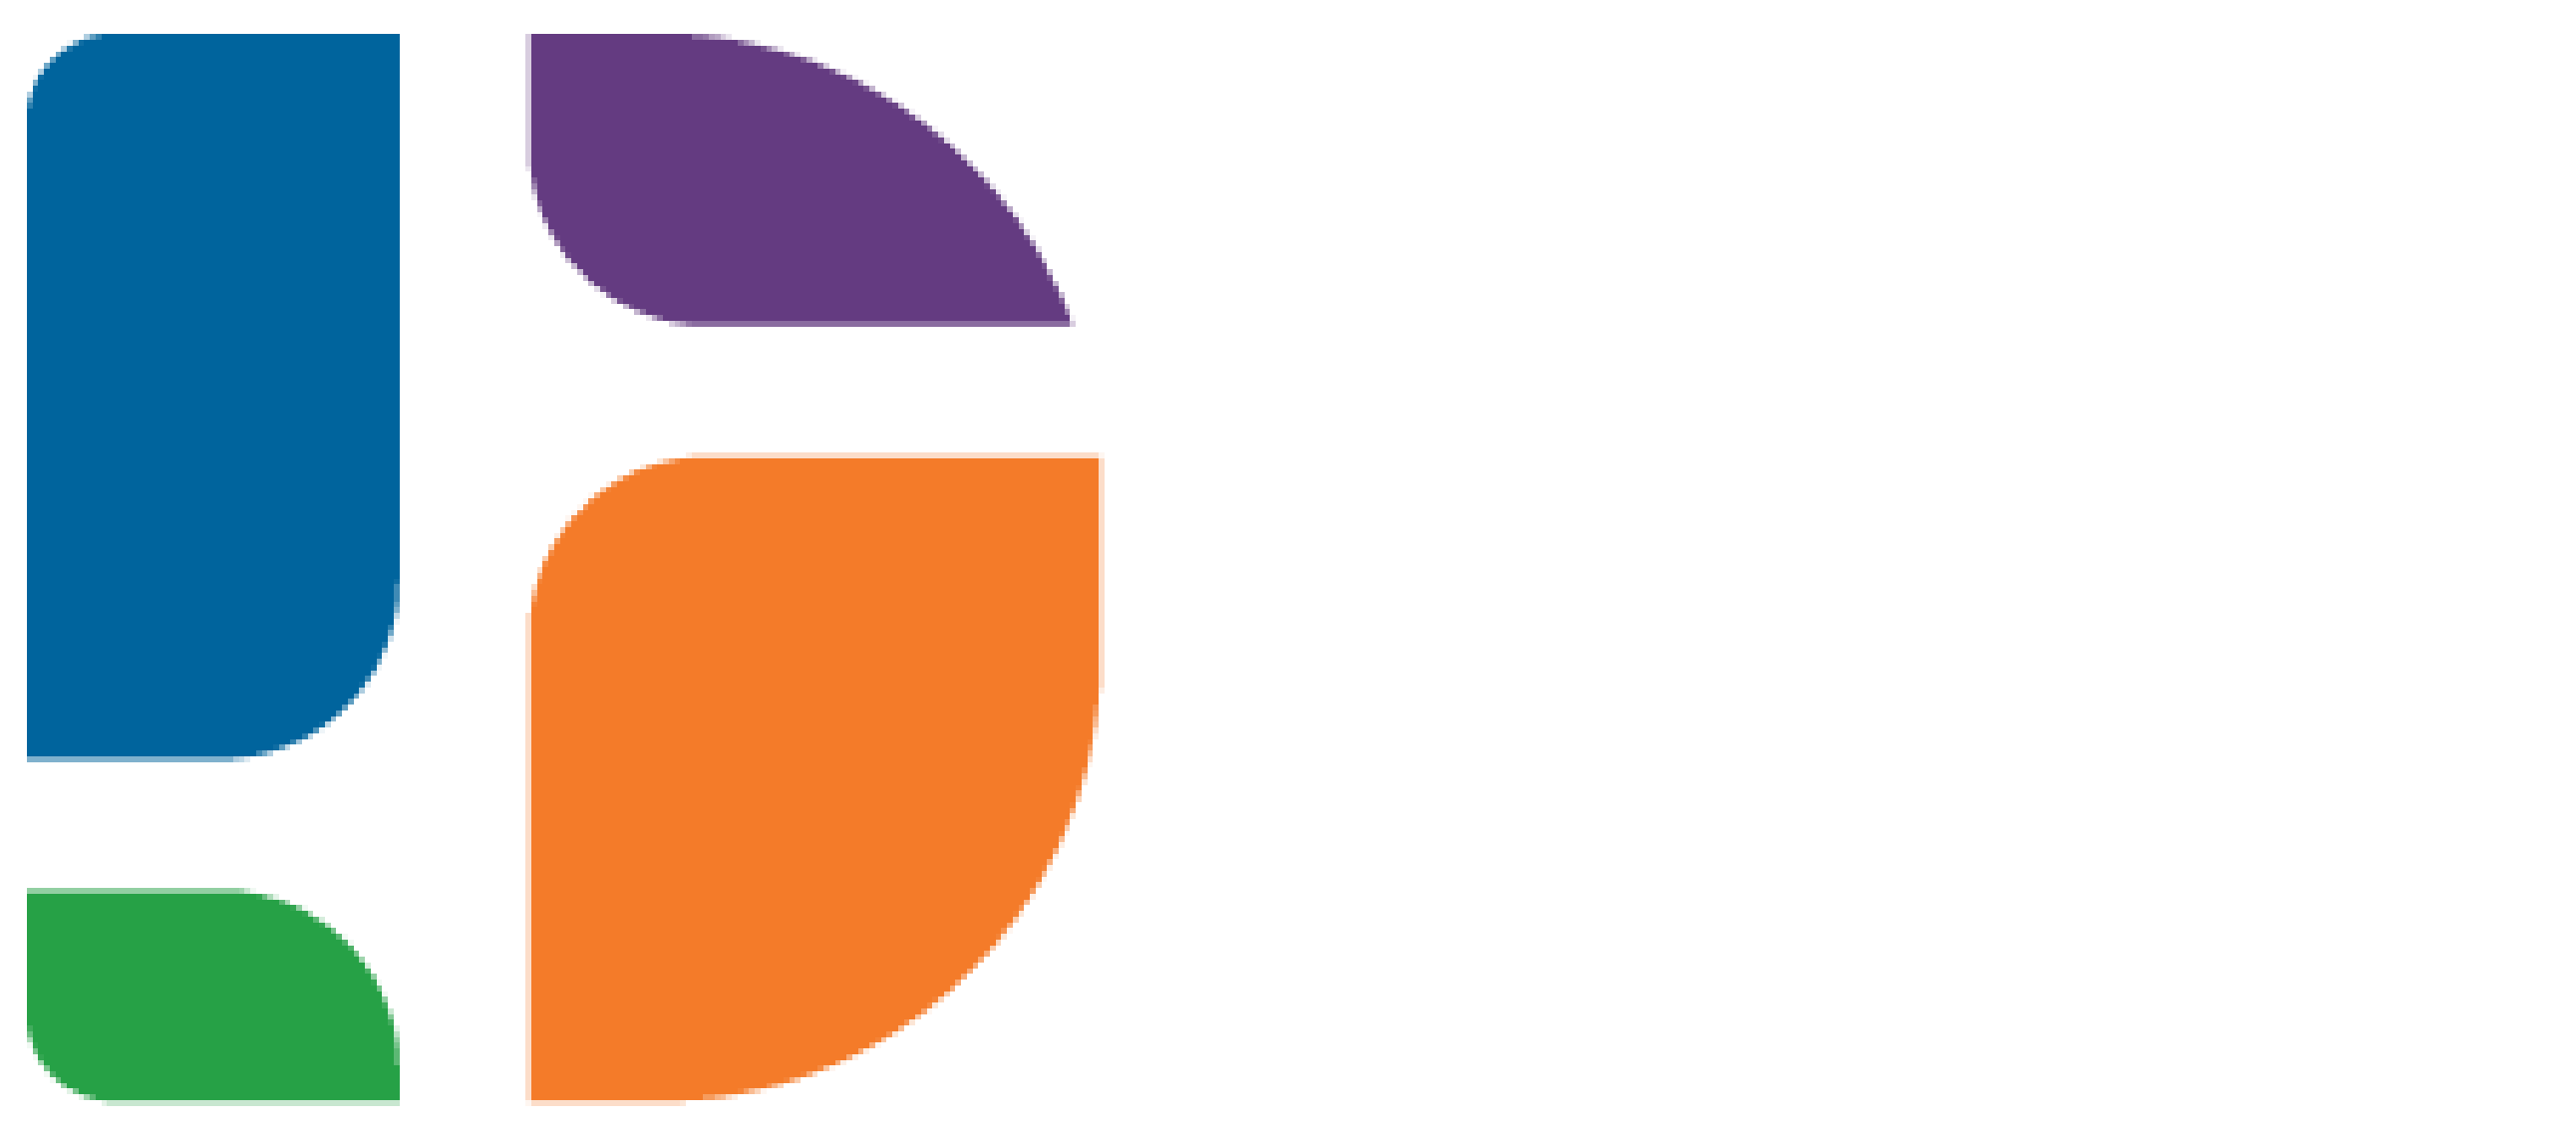 DTS Qld